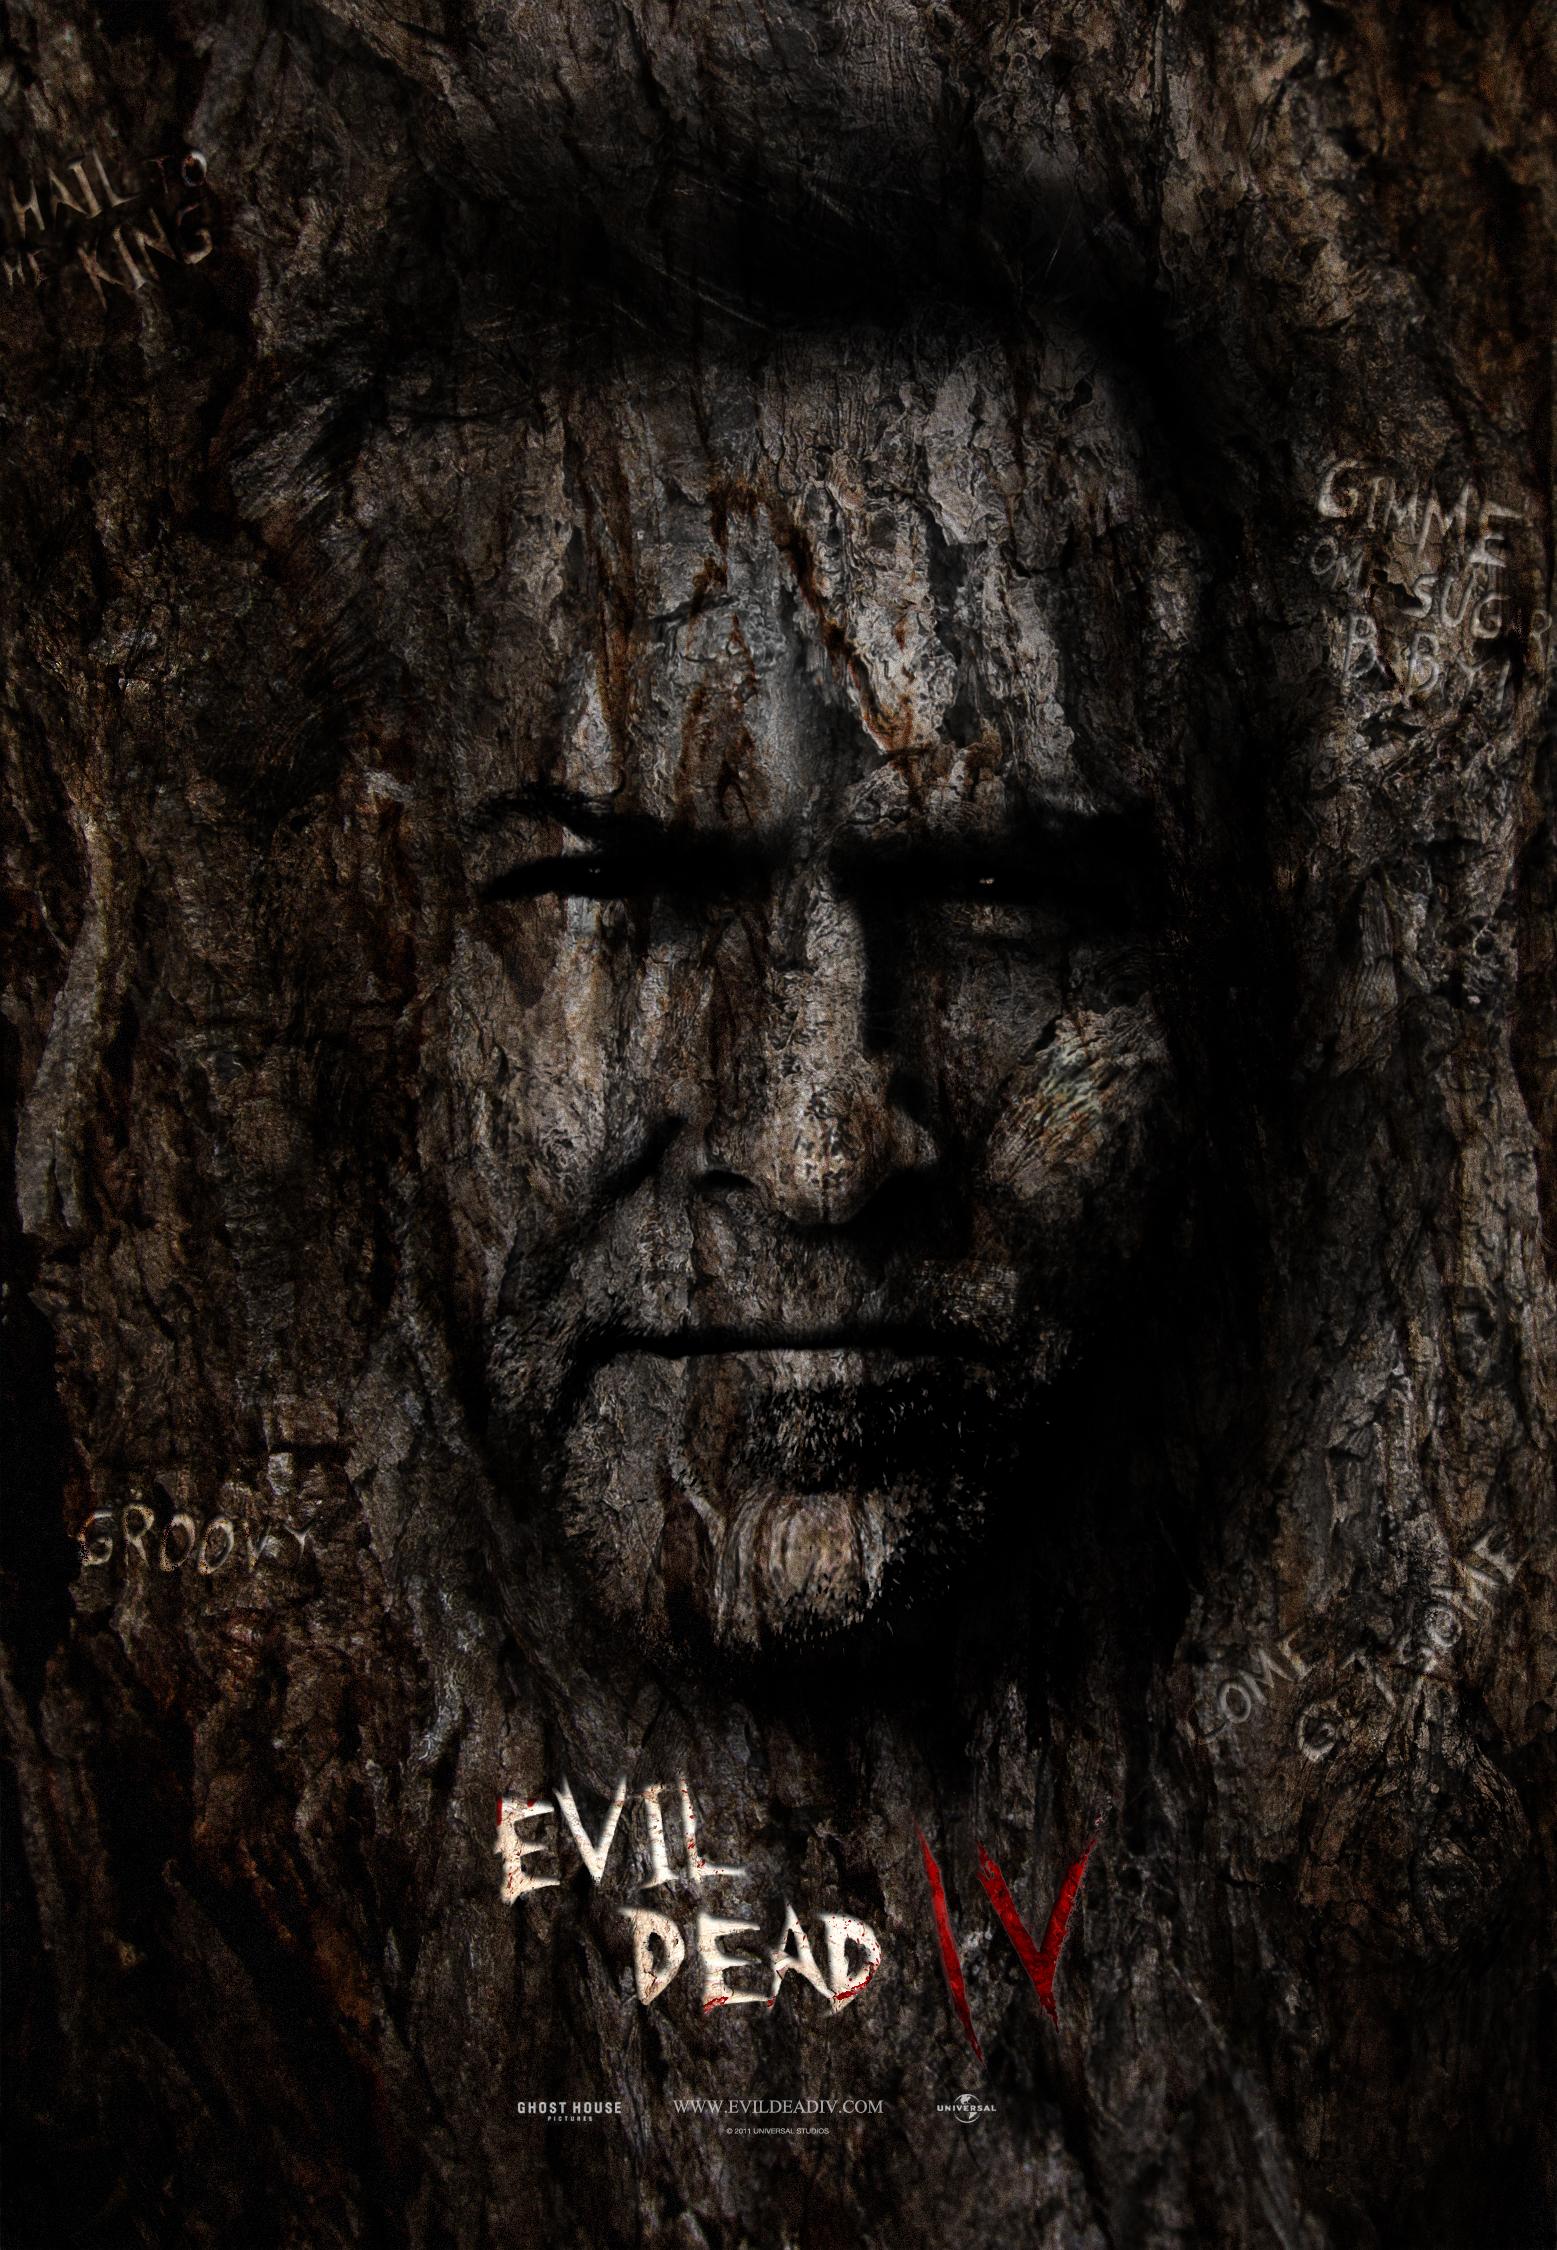 'Evil Dead IV' Teaser Poster